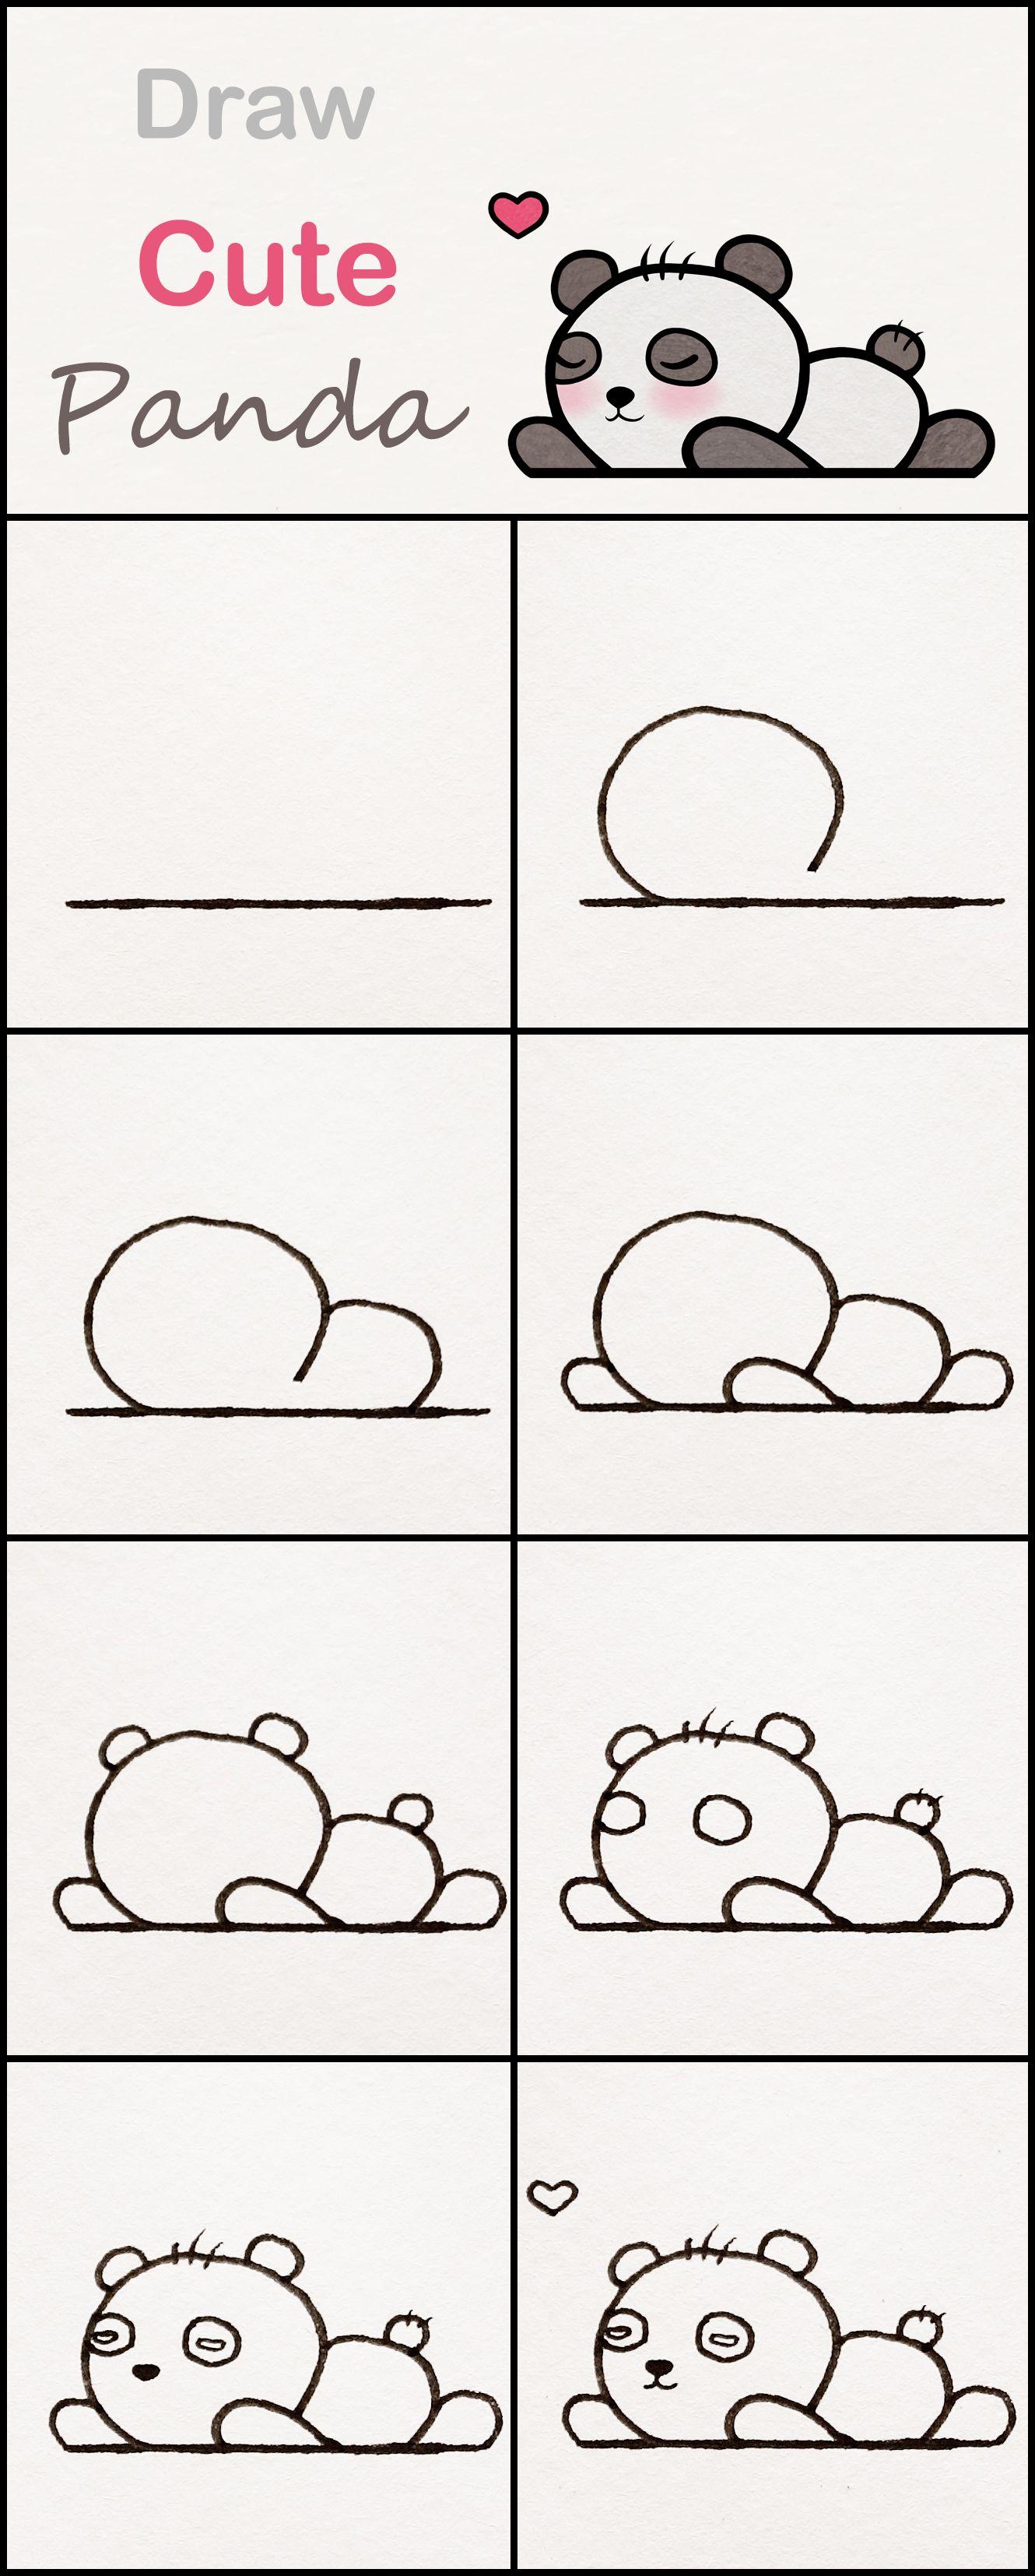 Learn How To Draw A Cute Baby Panda Step By Step Very Simple Tutorial Panda Drawings Kawaii Tutorial Cute Easy Drawings Easy Drawings Panda Drawing